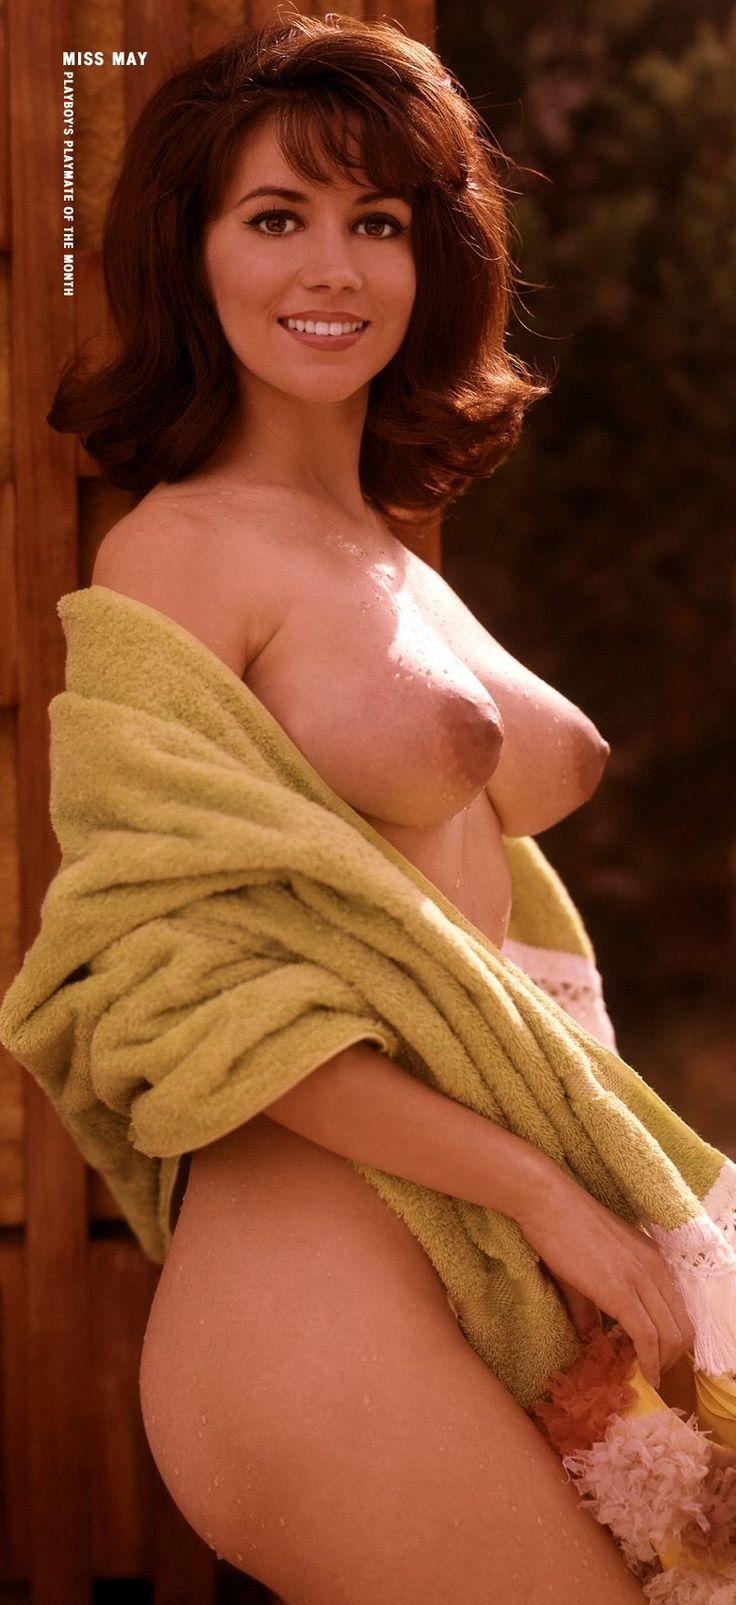 image Leslie winston melanie scott peter north in vintage porn Part 8